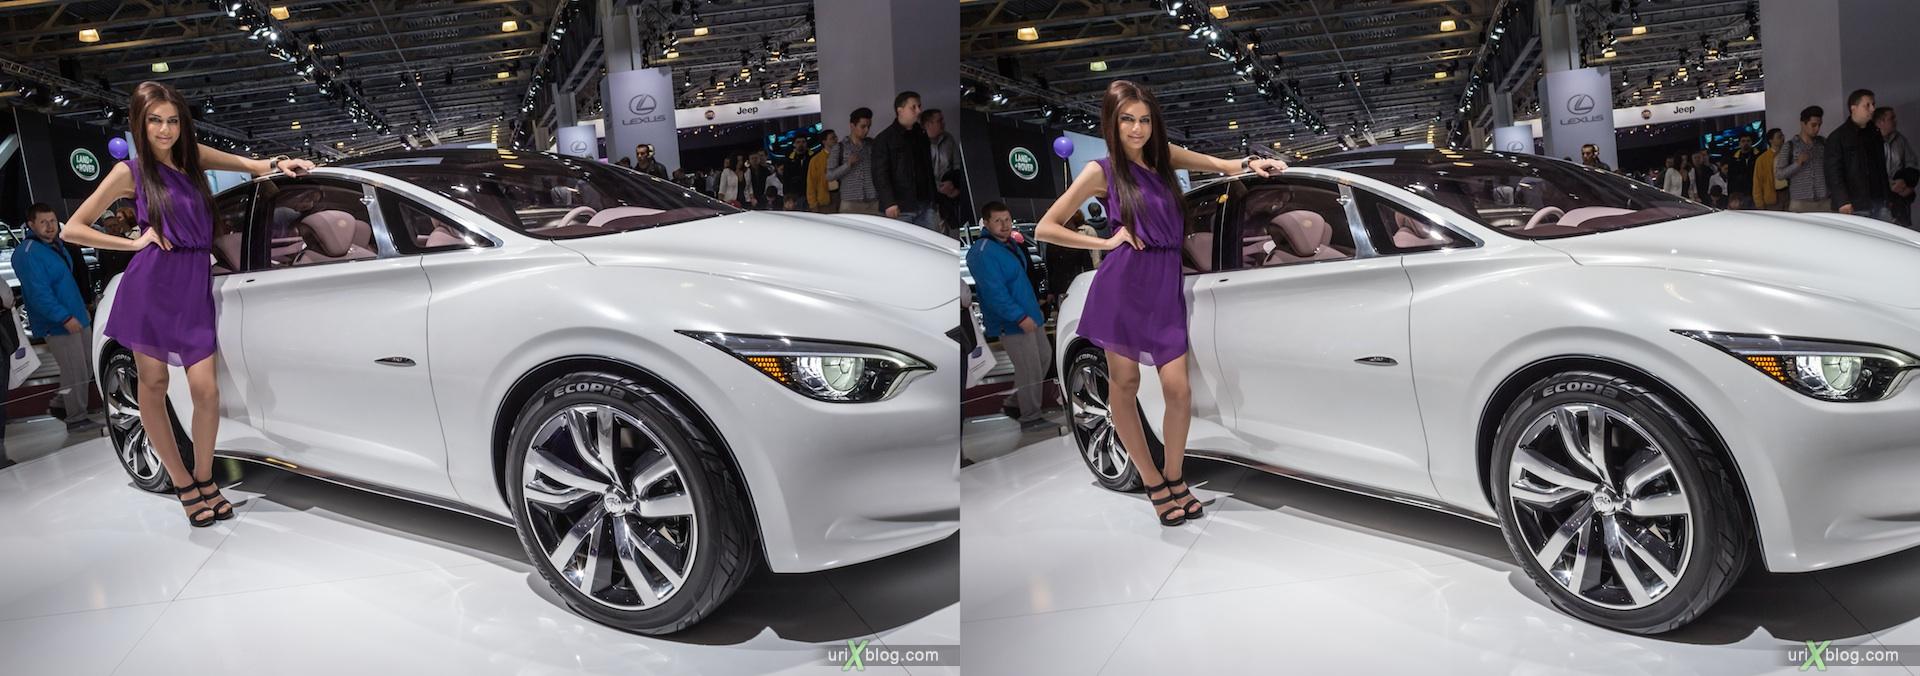 2012, Lexus, девушка, модель, girl, model, Moscow International Automobile Salon, auto show, 3D, stereo pair, cross-eyed, crossview